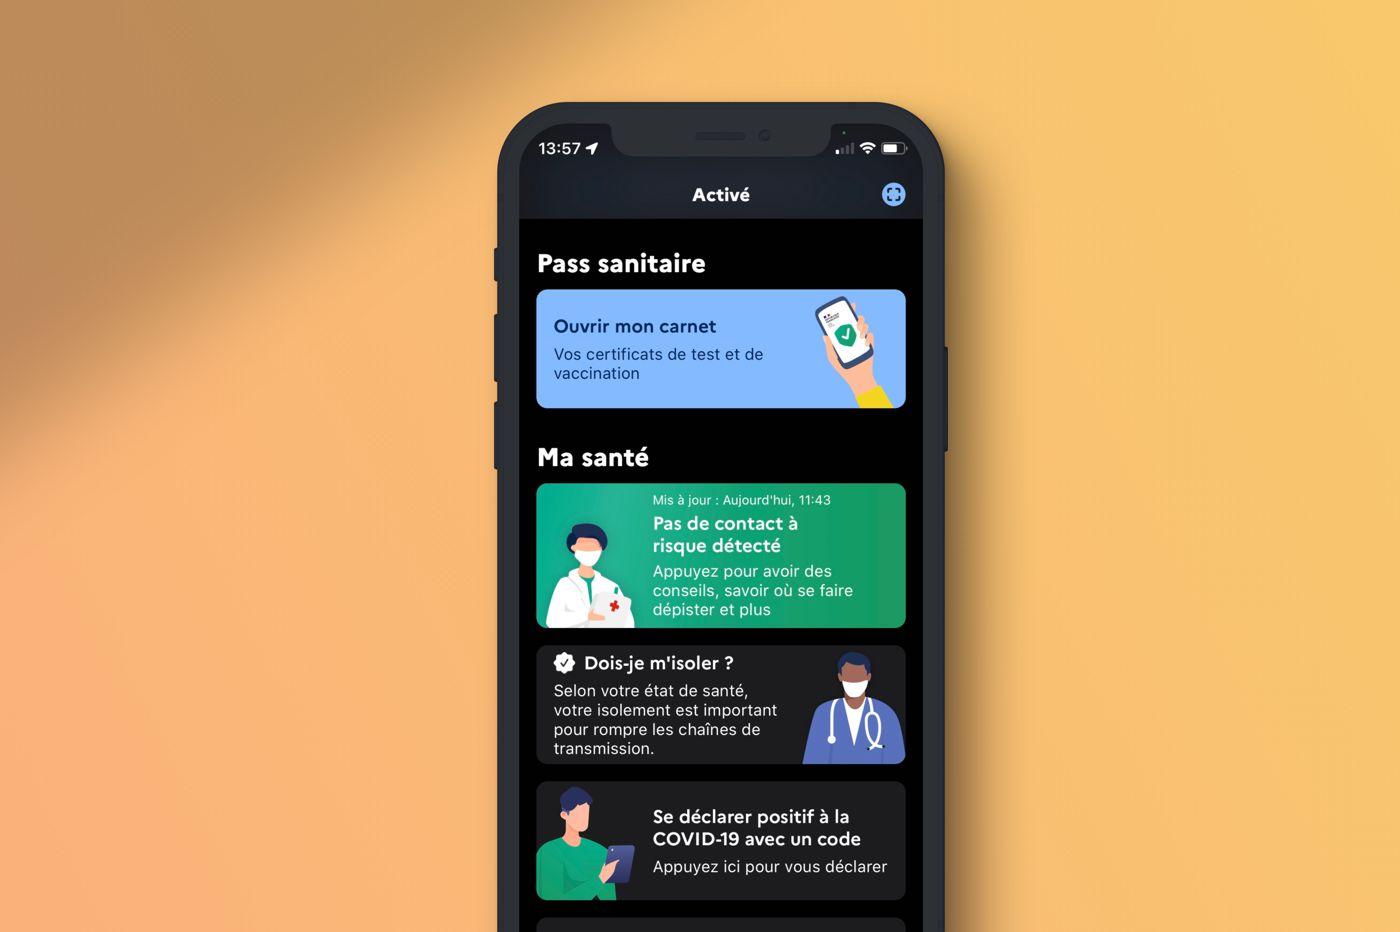 Pass sanitaire app TousAntiCovid